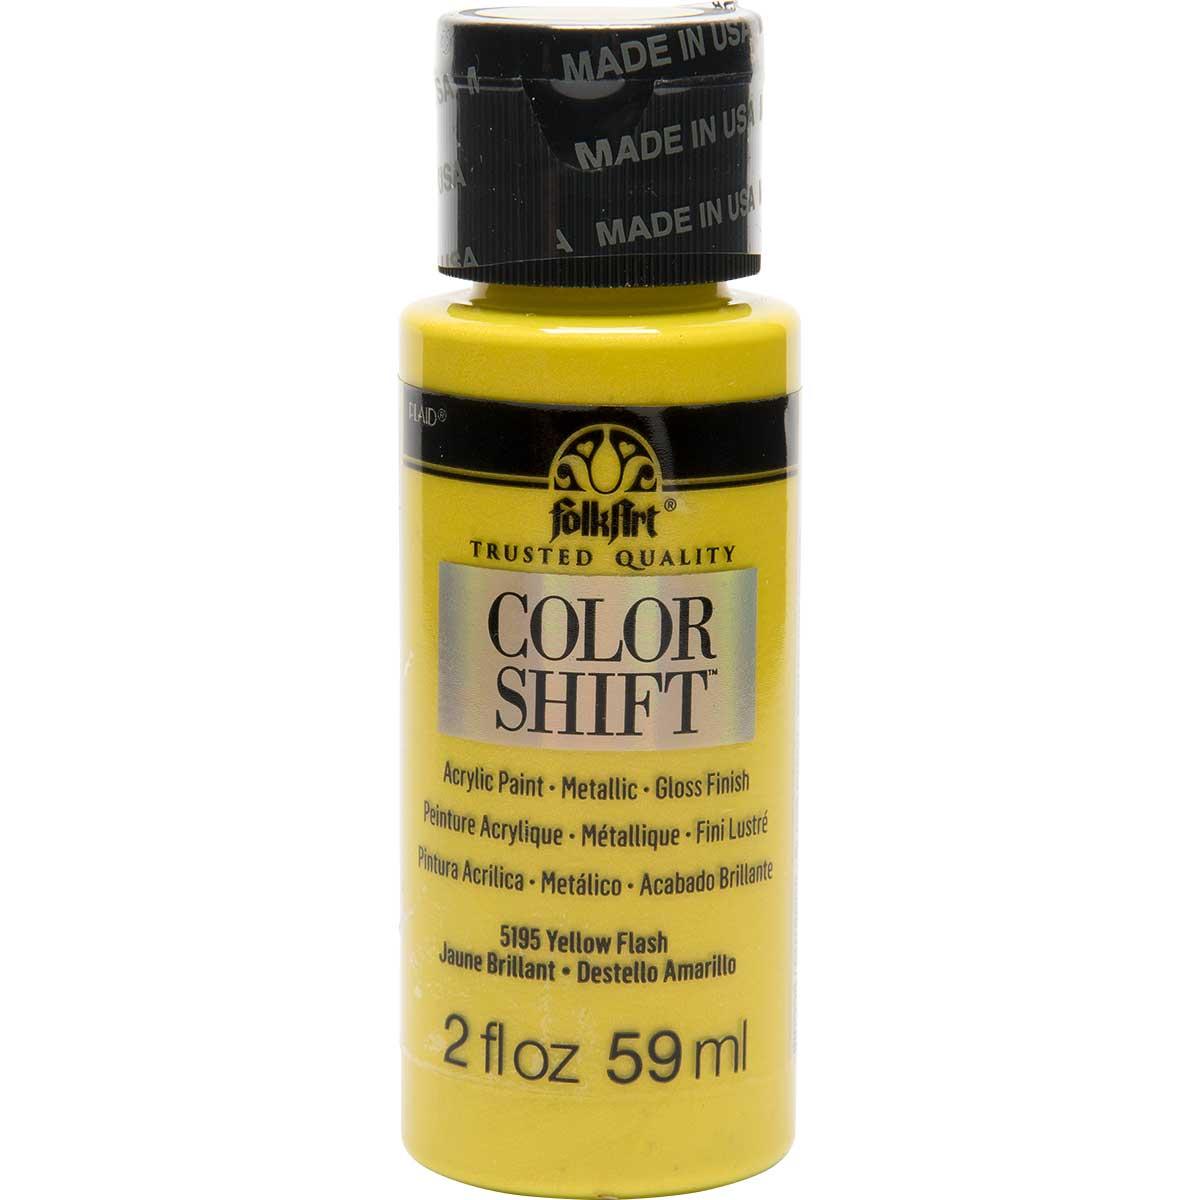 FolkArt ® Color Shift™ Acrylic Paint - Yellow Flash, 2 oz.